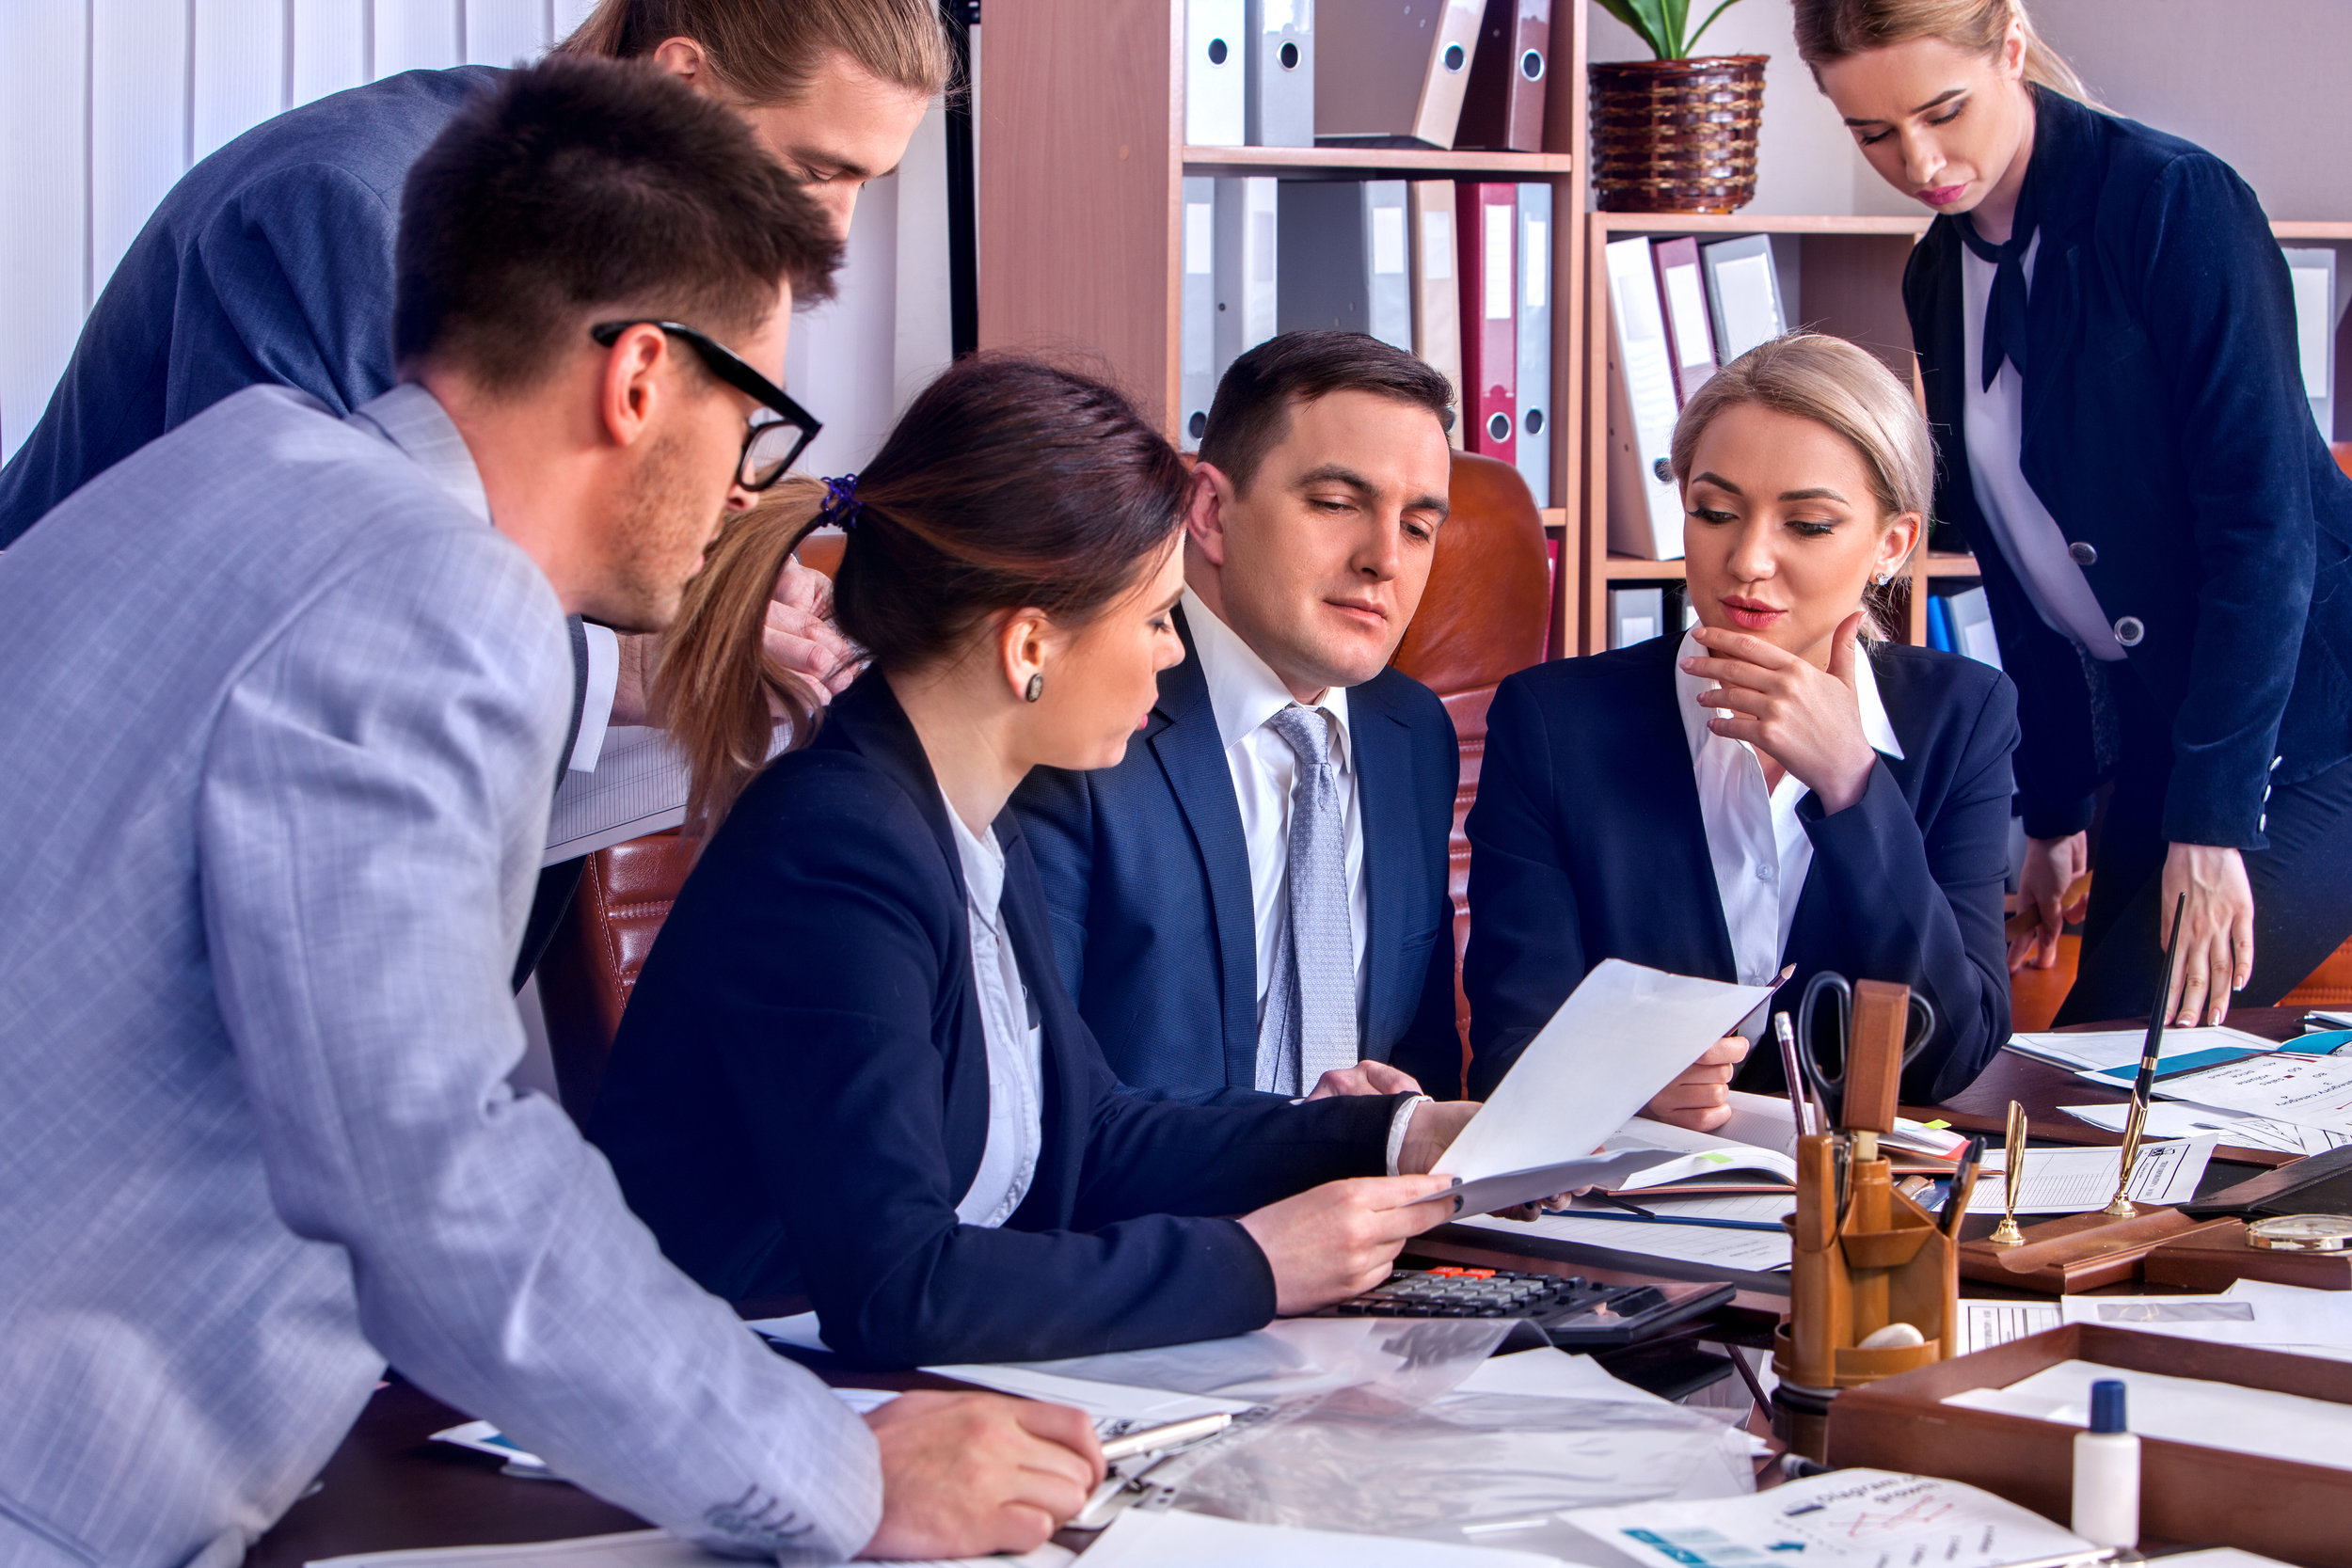 bigstock-Business-people-office-life-of-186591271.jpg